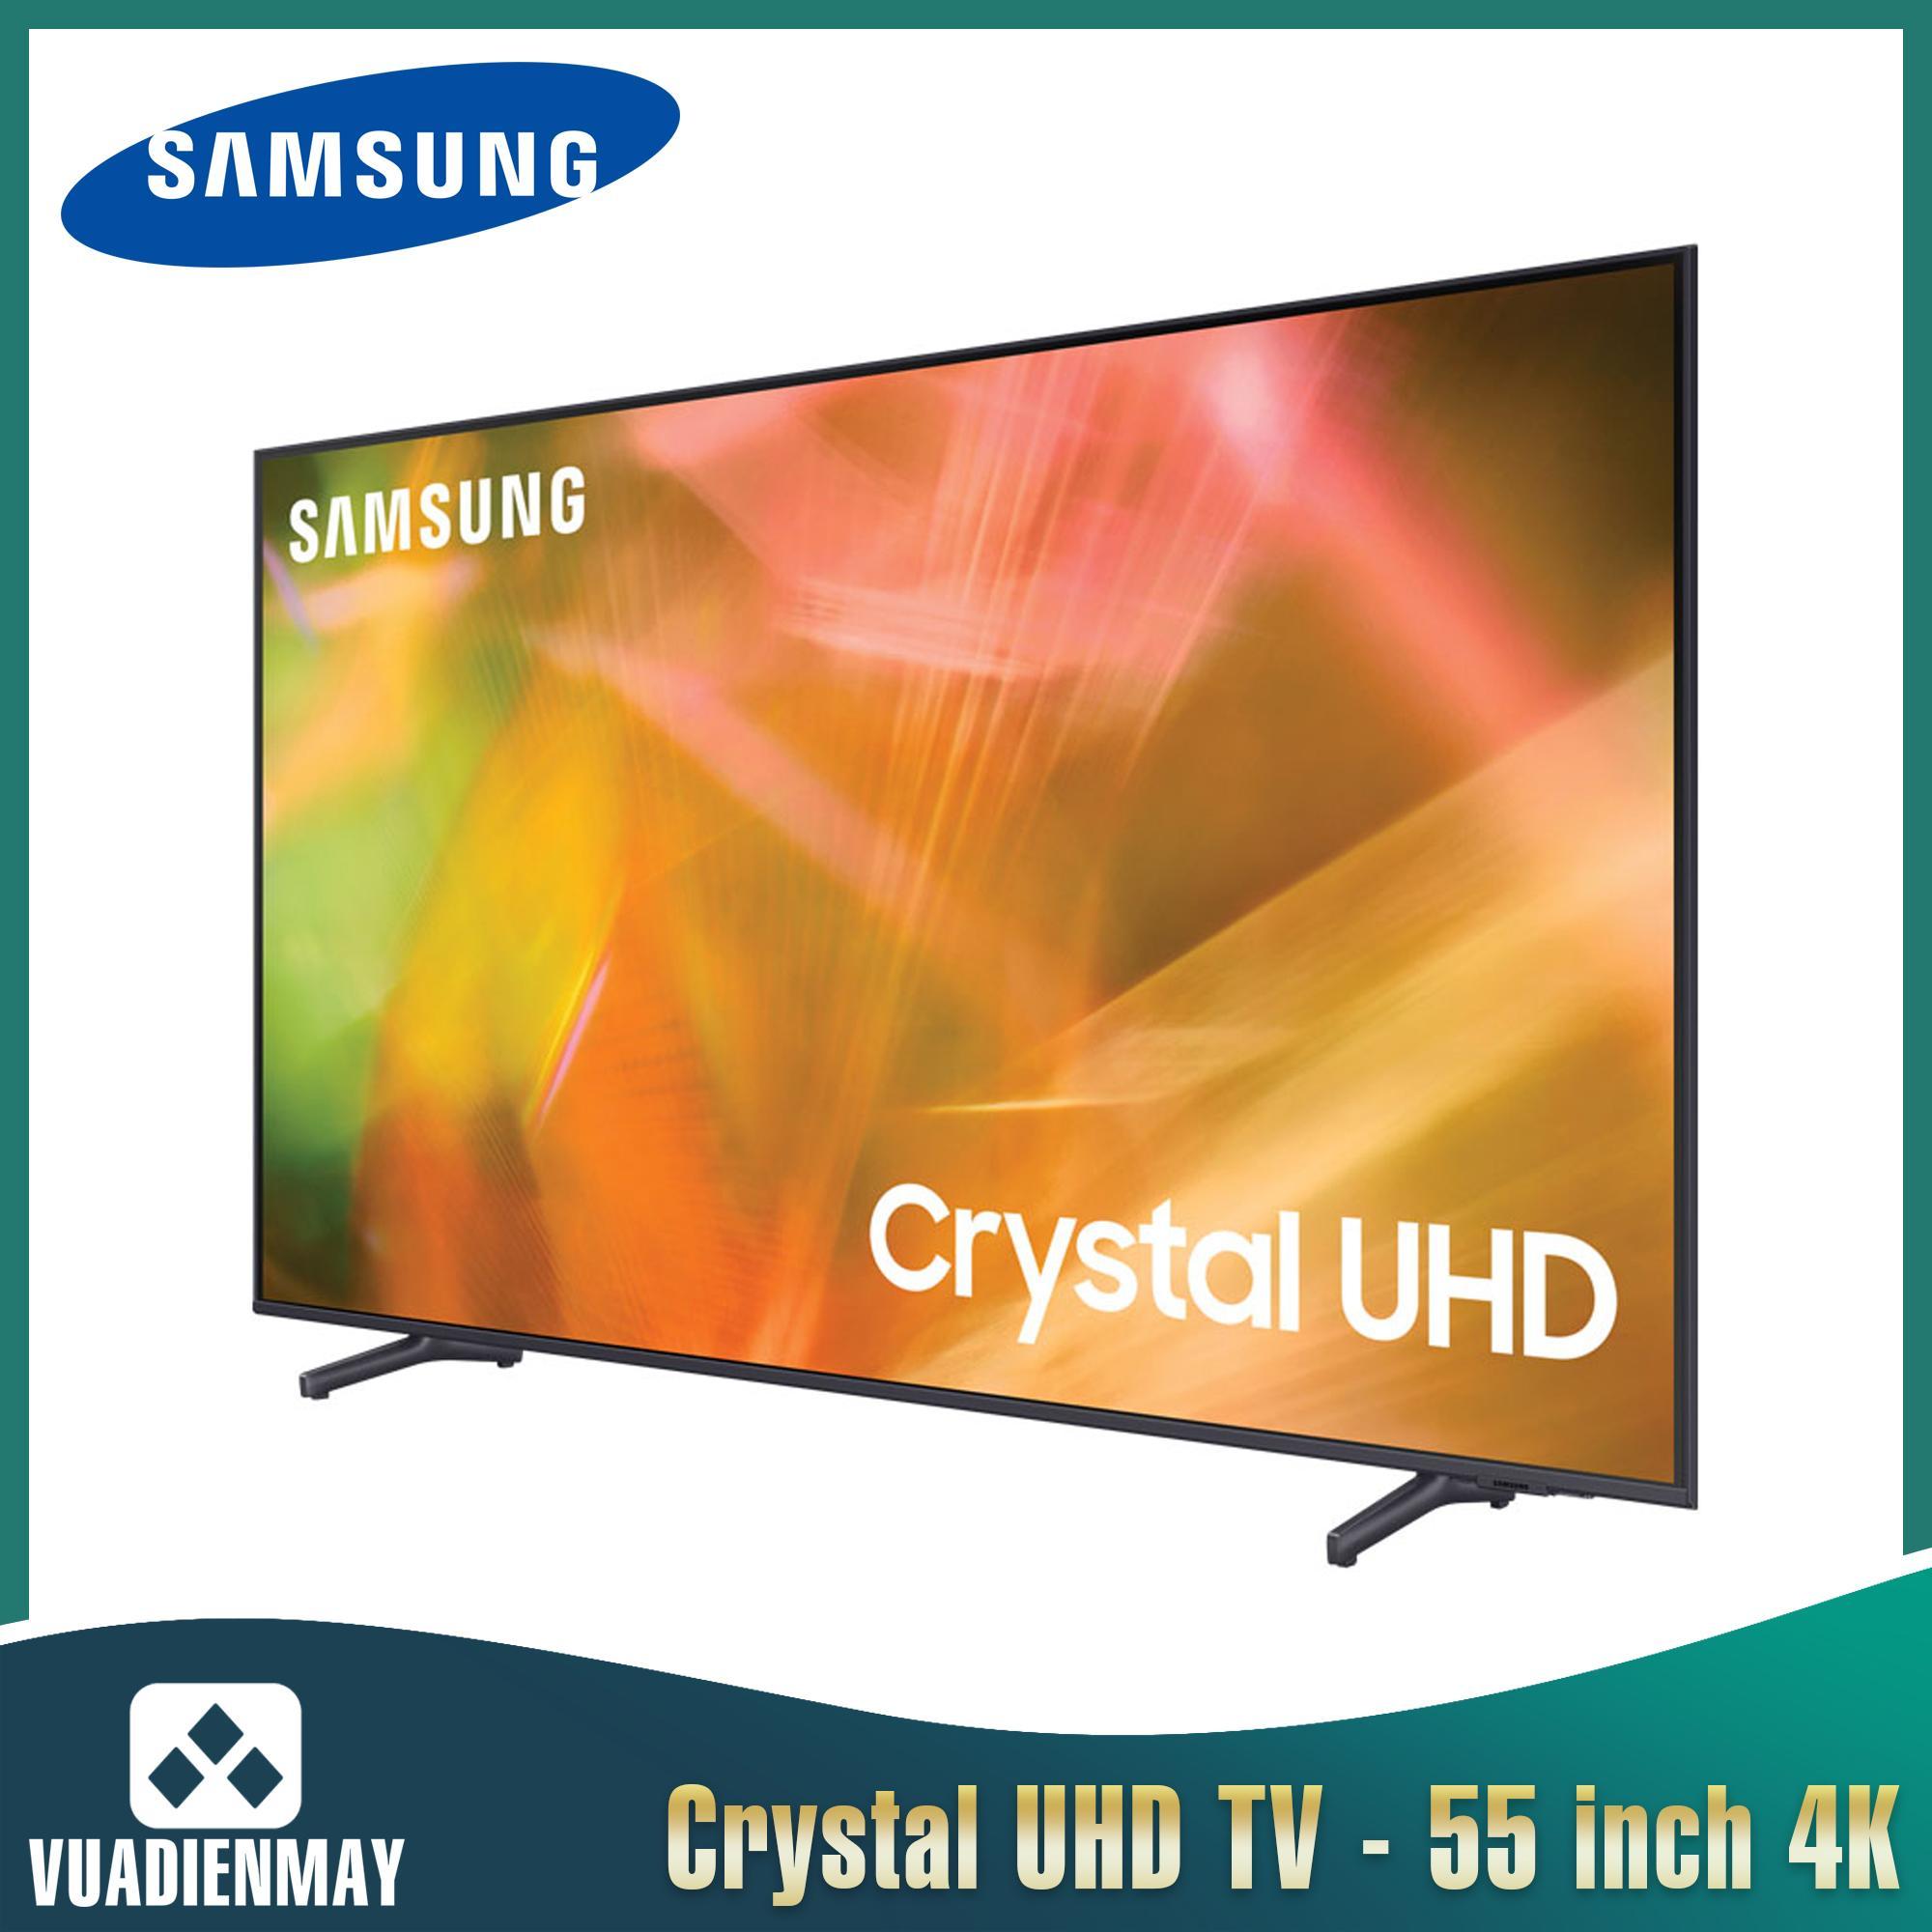 Tivi Samsung Crystal UHD 4K 55 inch